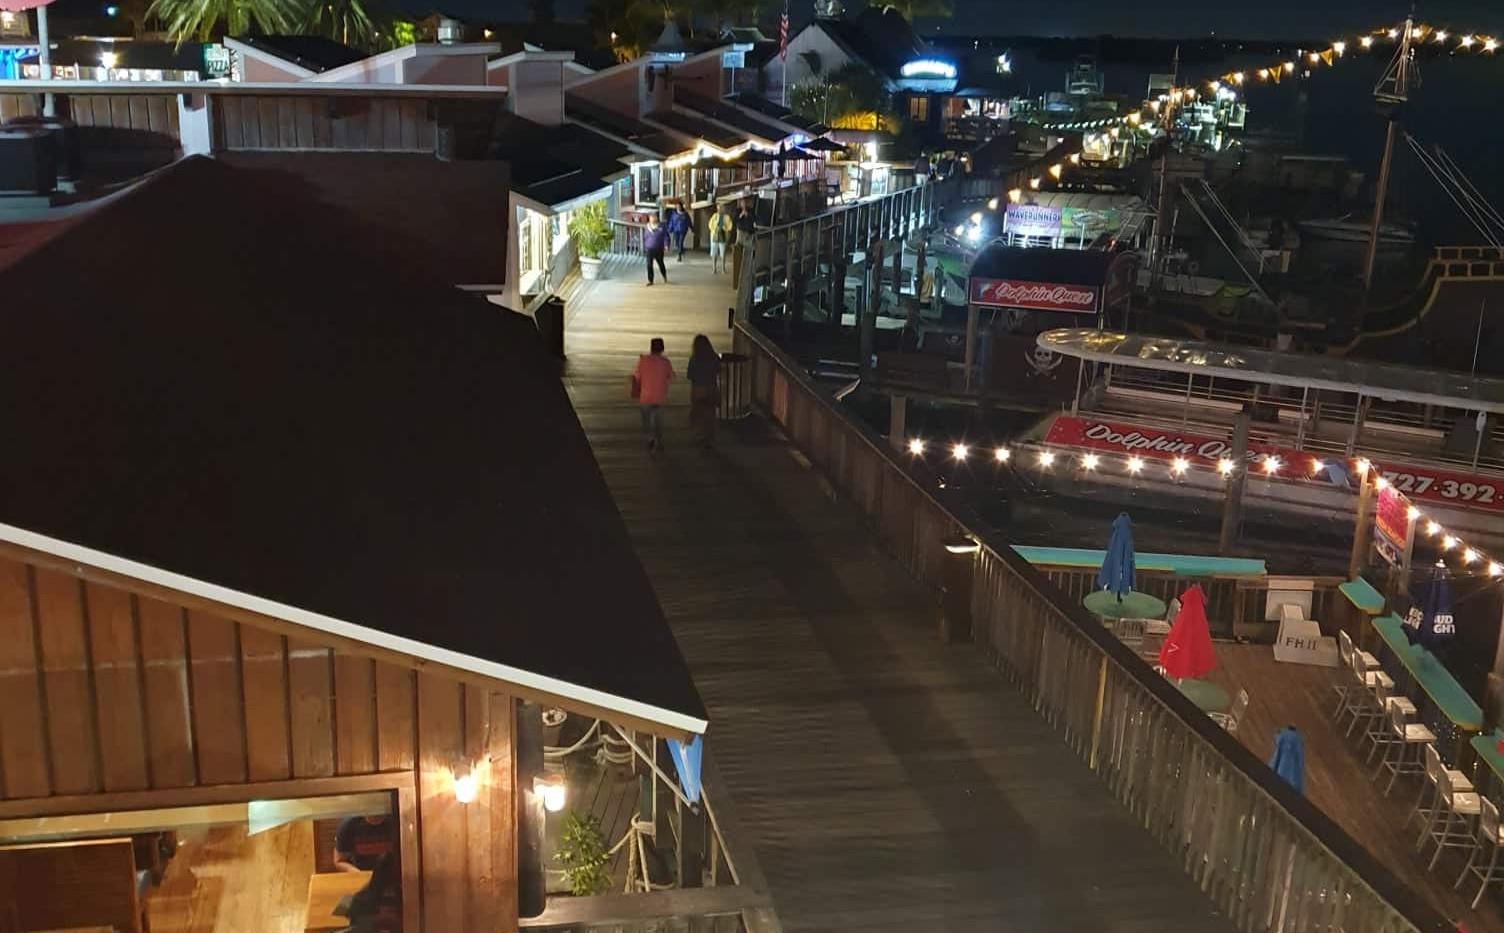 John's Pass Village & Boardwalk